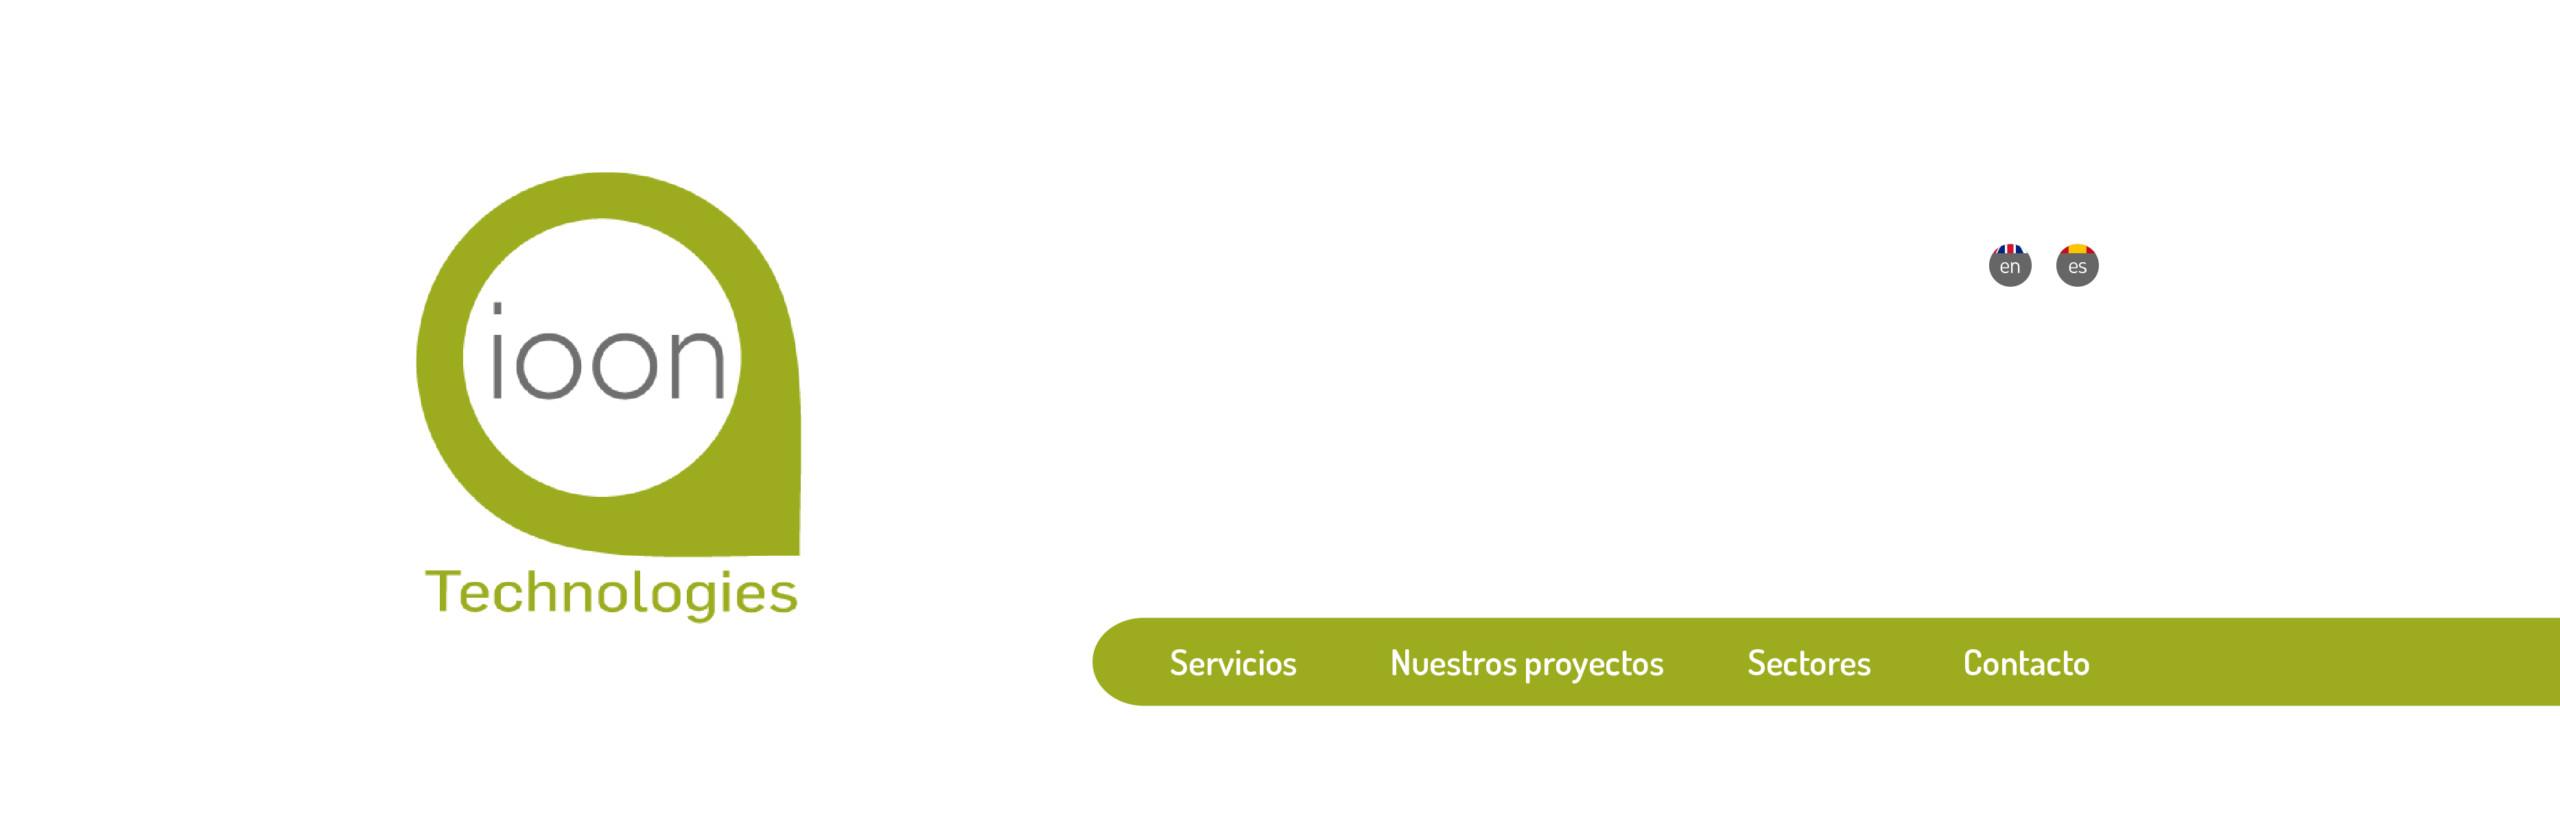 menu ioon technologies | Borja Echevarria